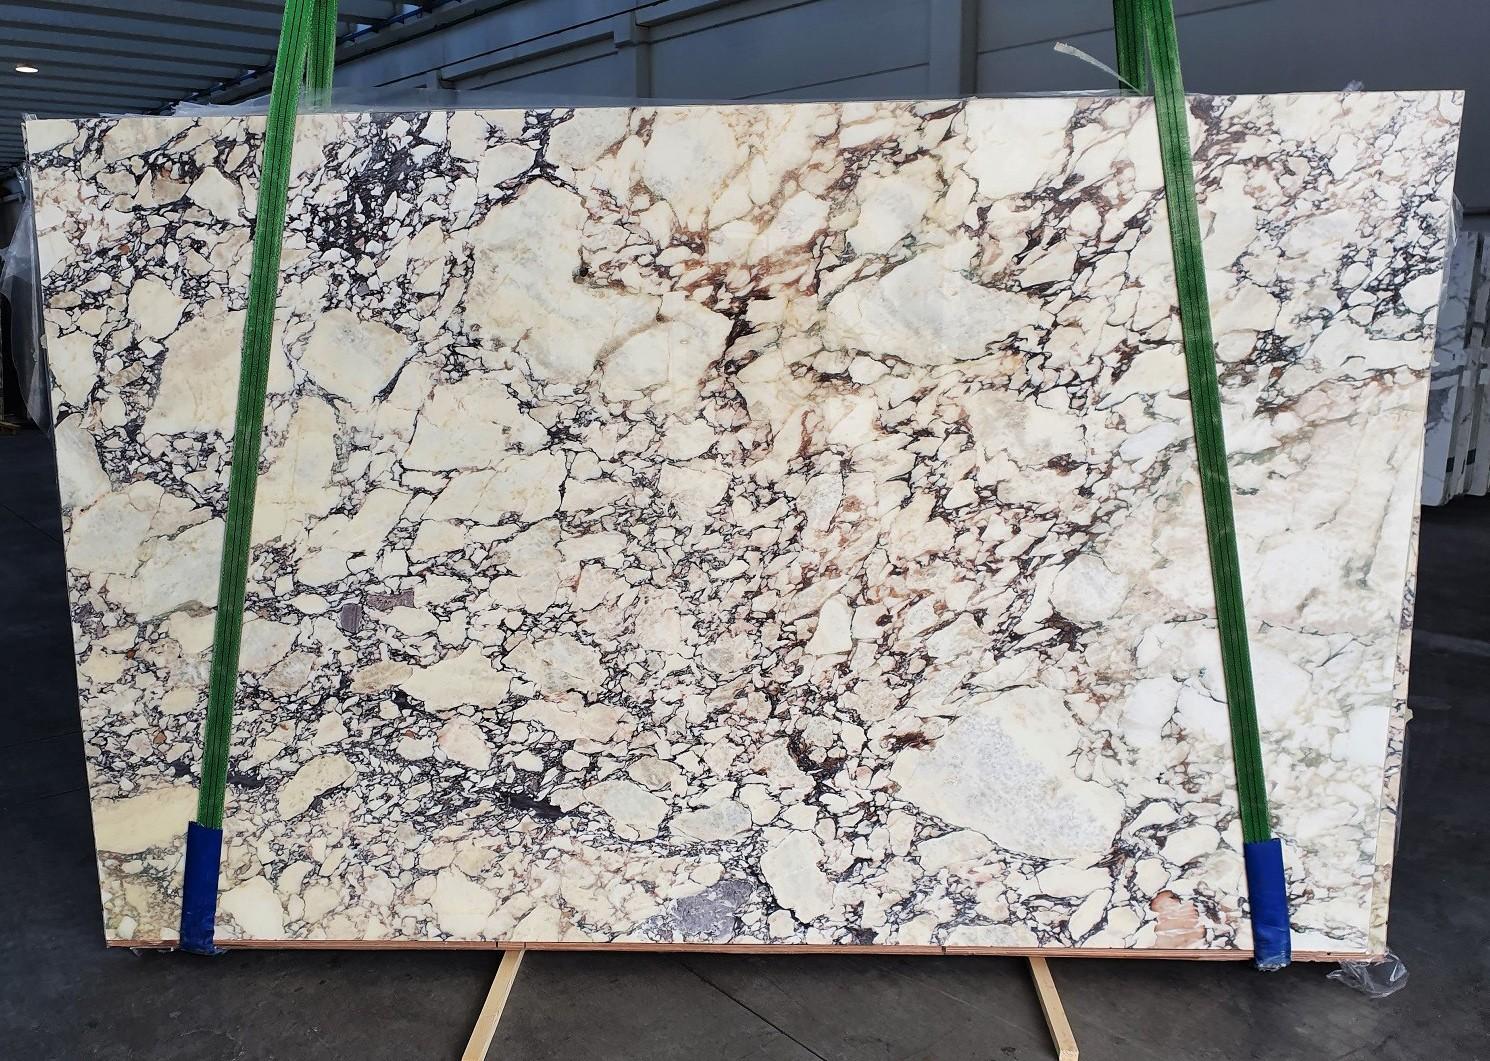 CALACATTA VIOLA Supply Veneto (Italy) polished slabs 1291 , Slab #10 natural marble